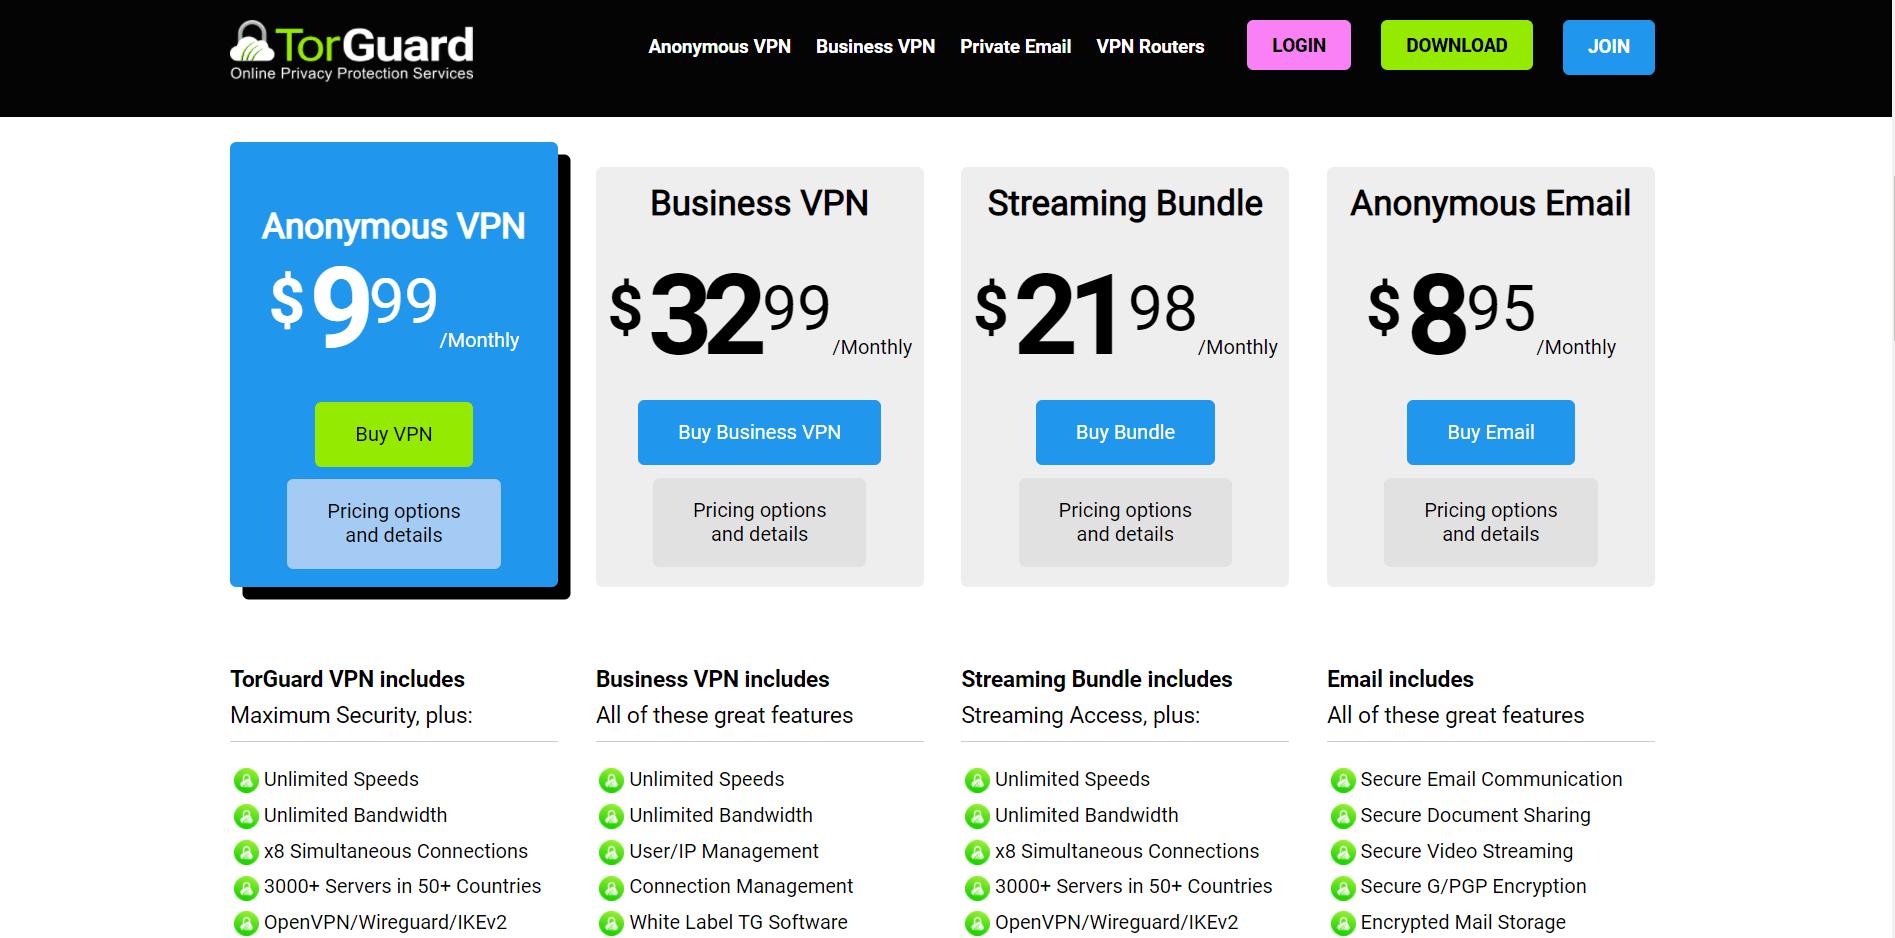 torguard pricing